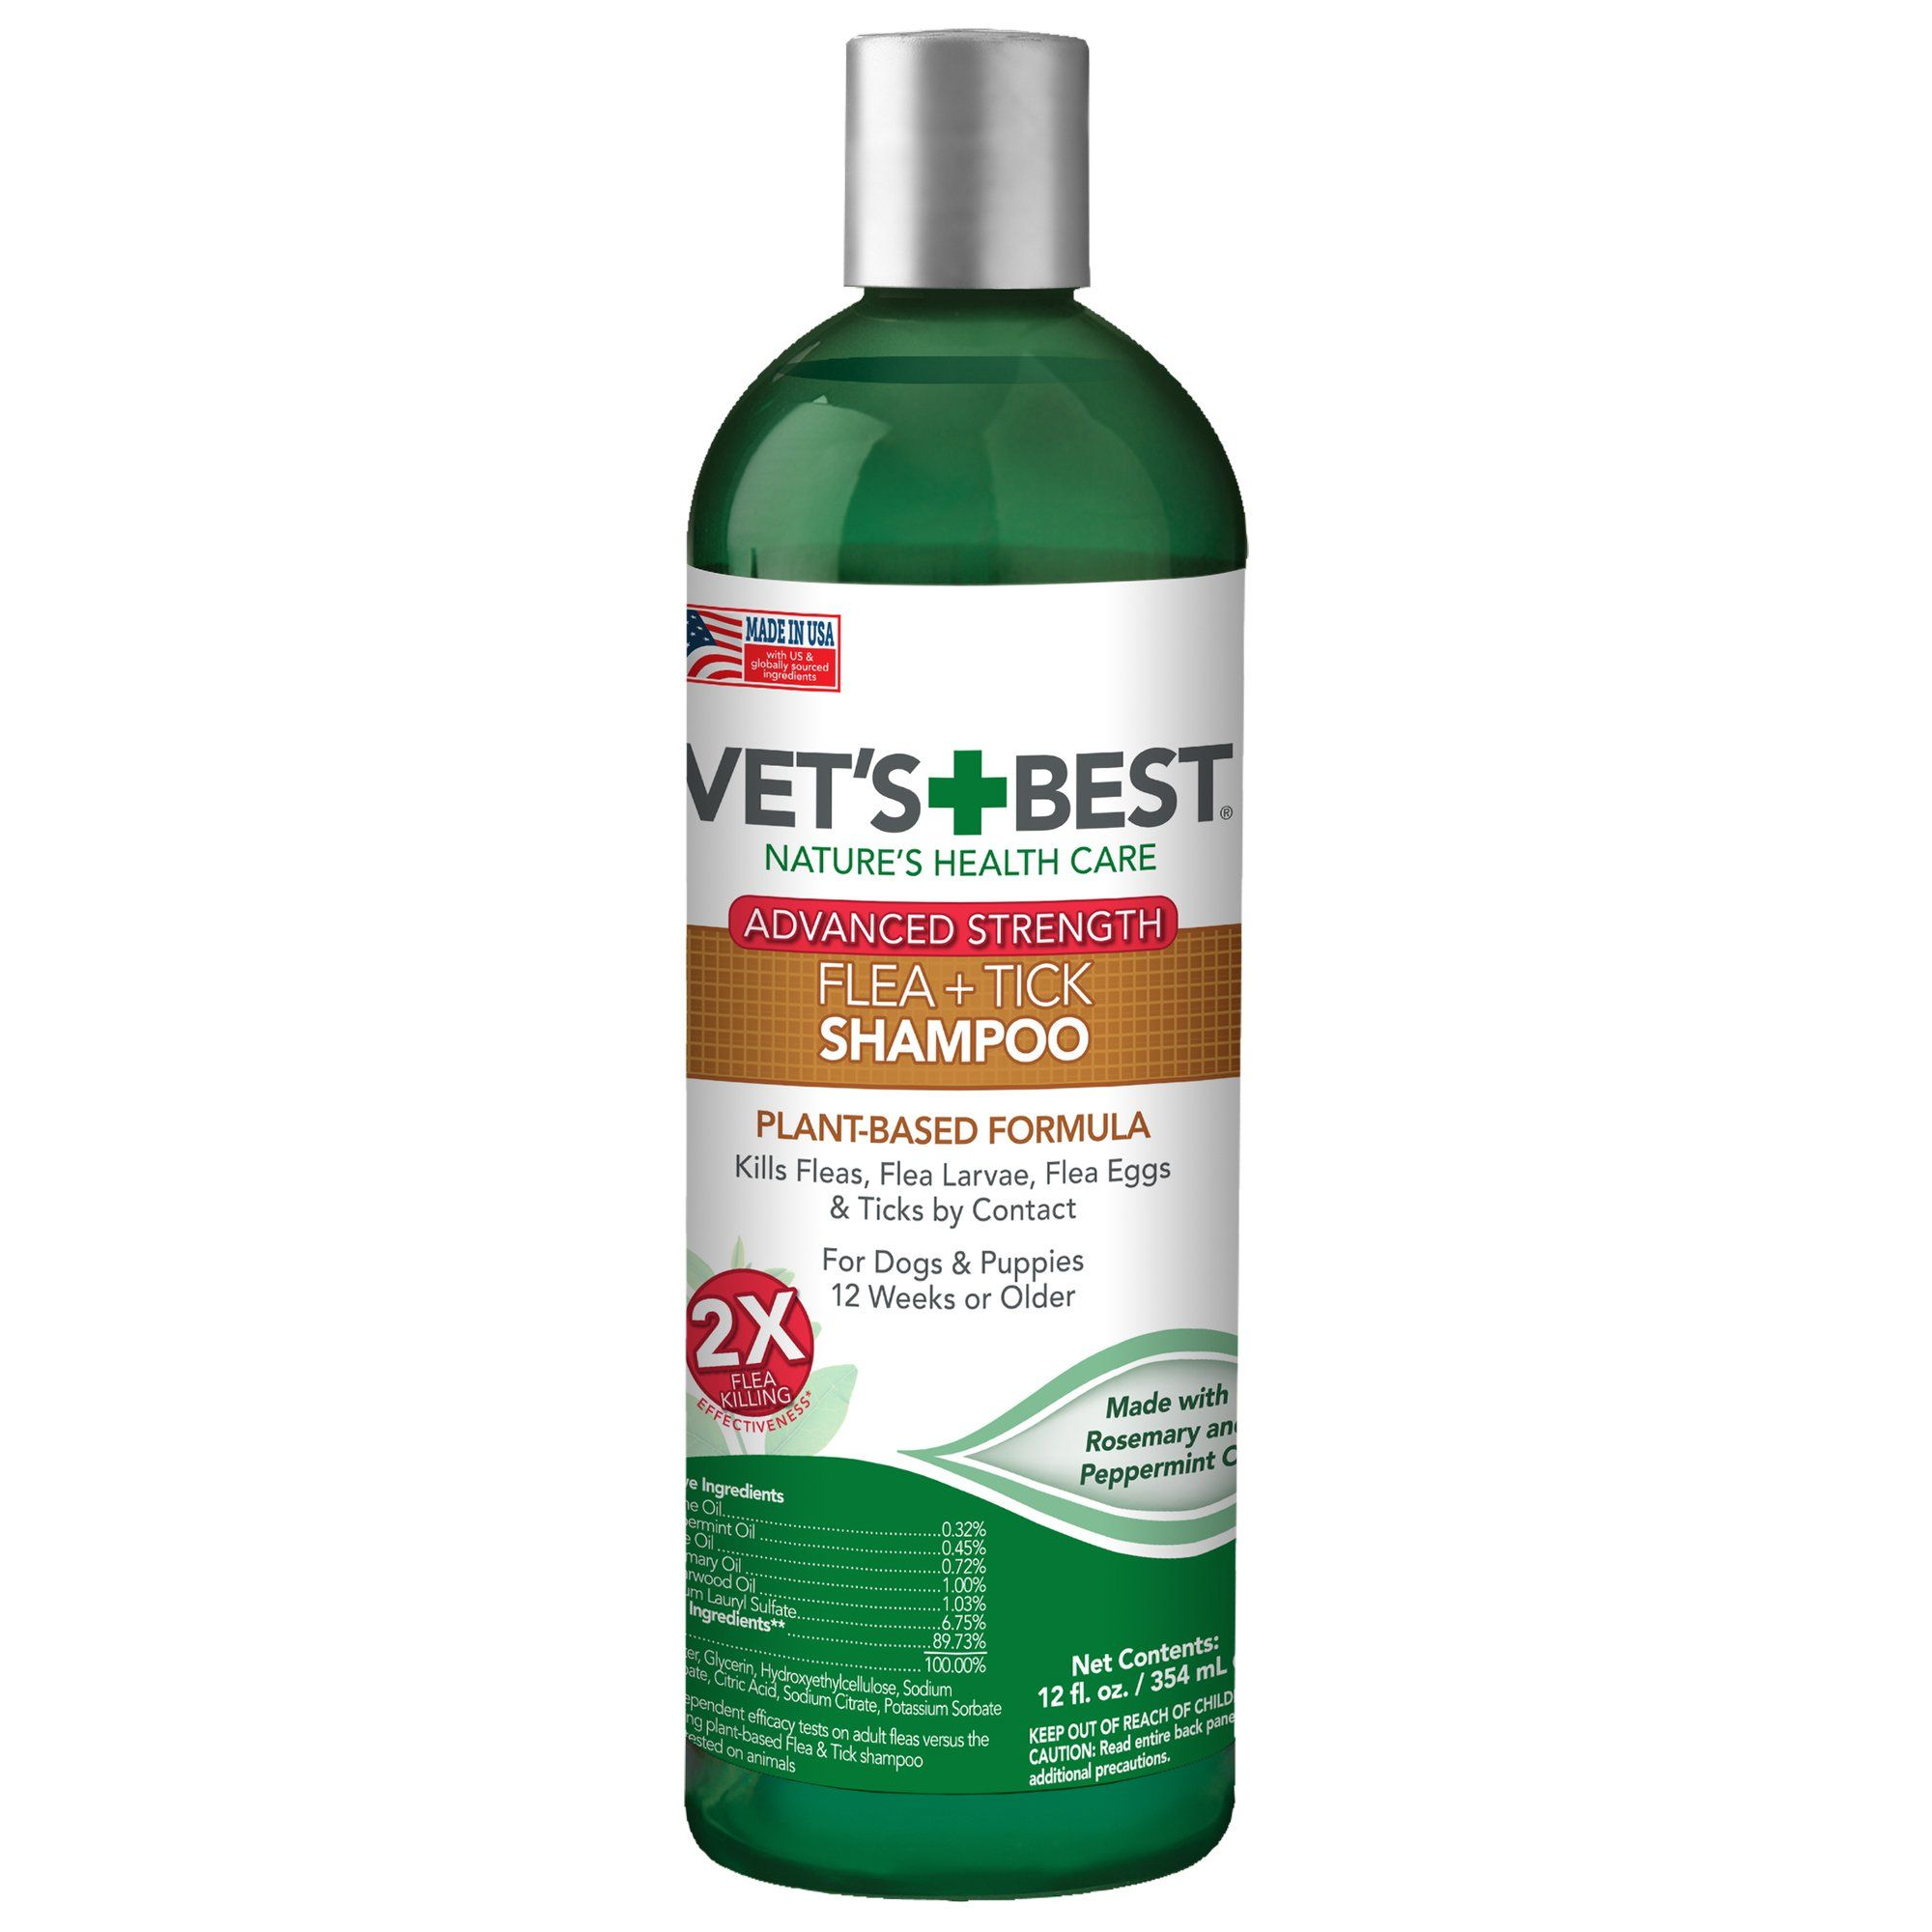 Vet's Best Advanced Strength Flea + Tick Dog Shampoo, 12